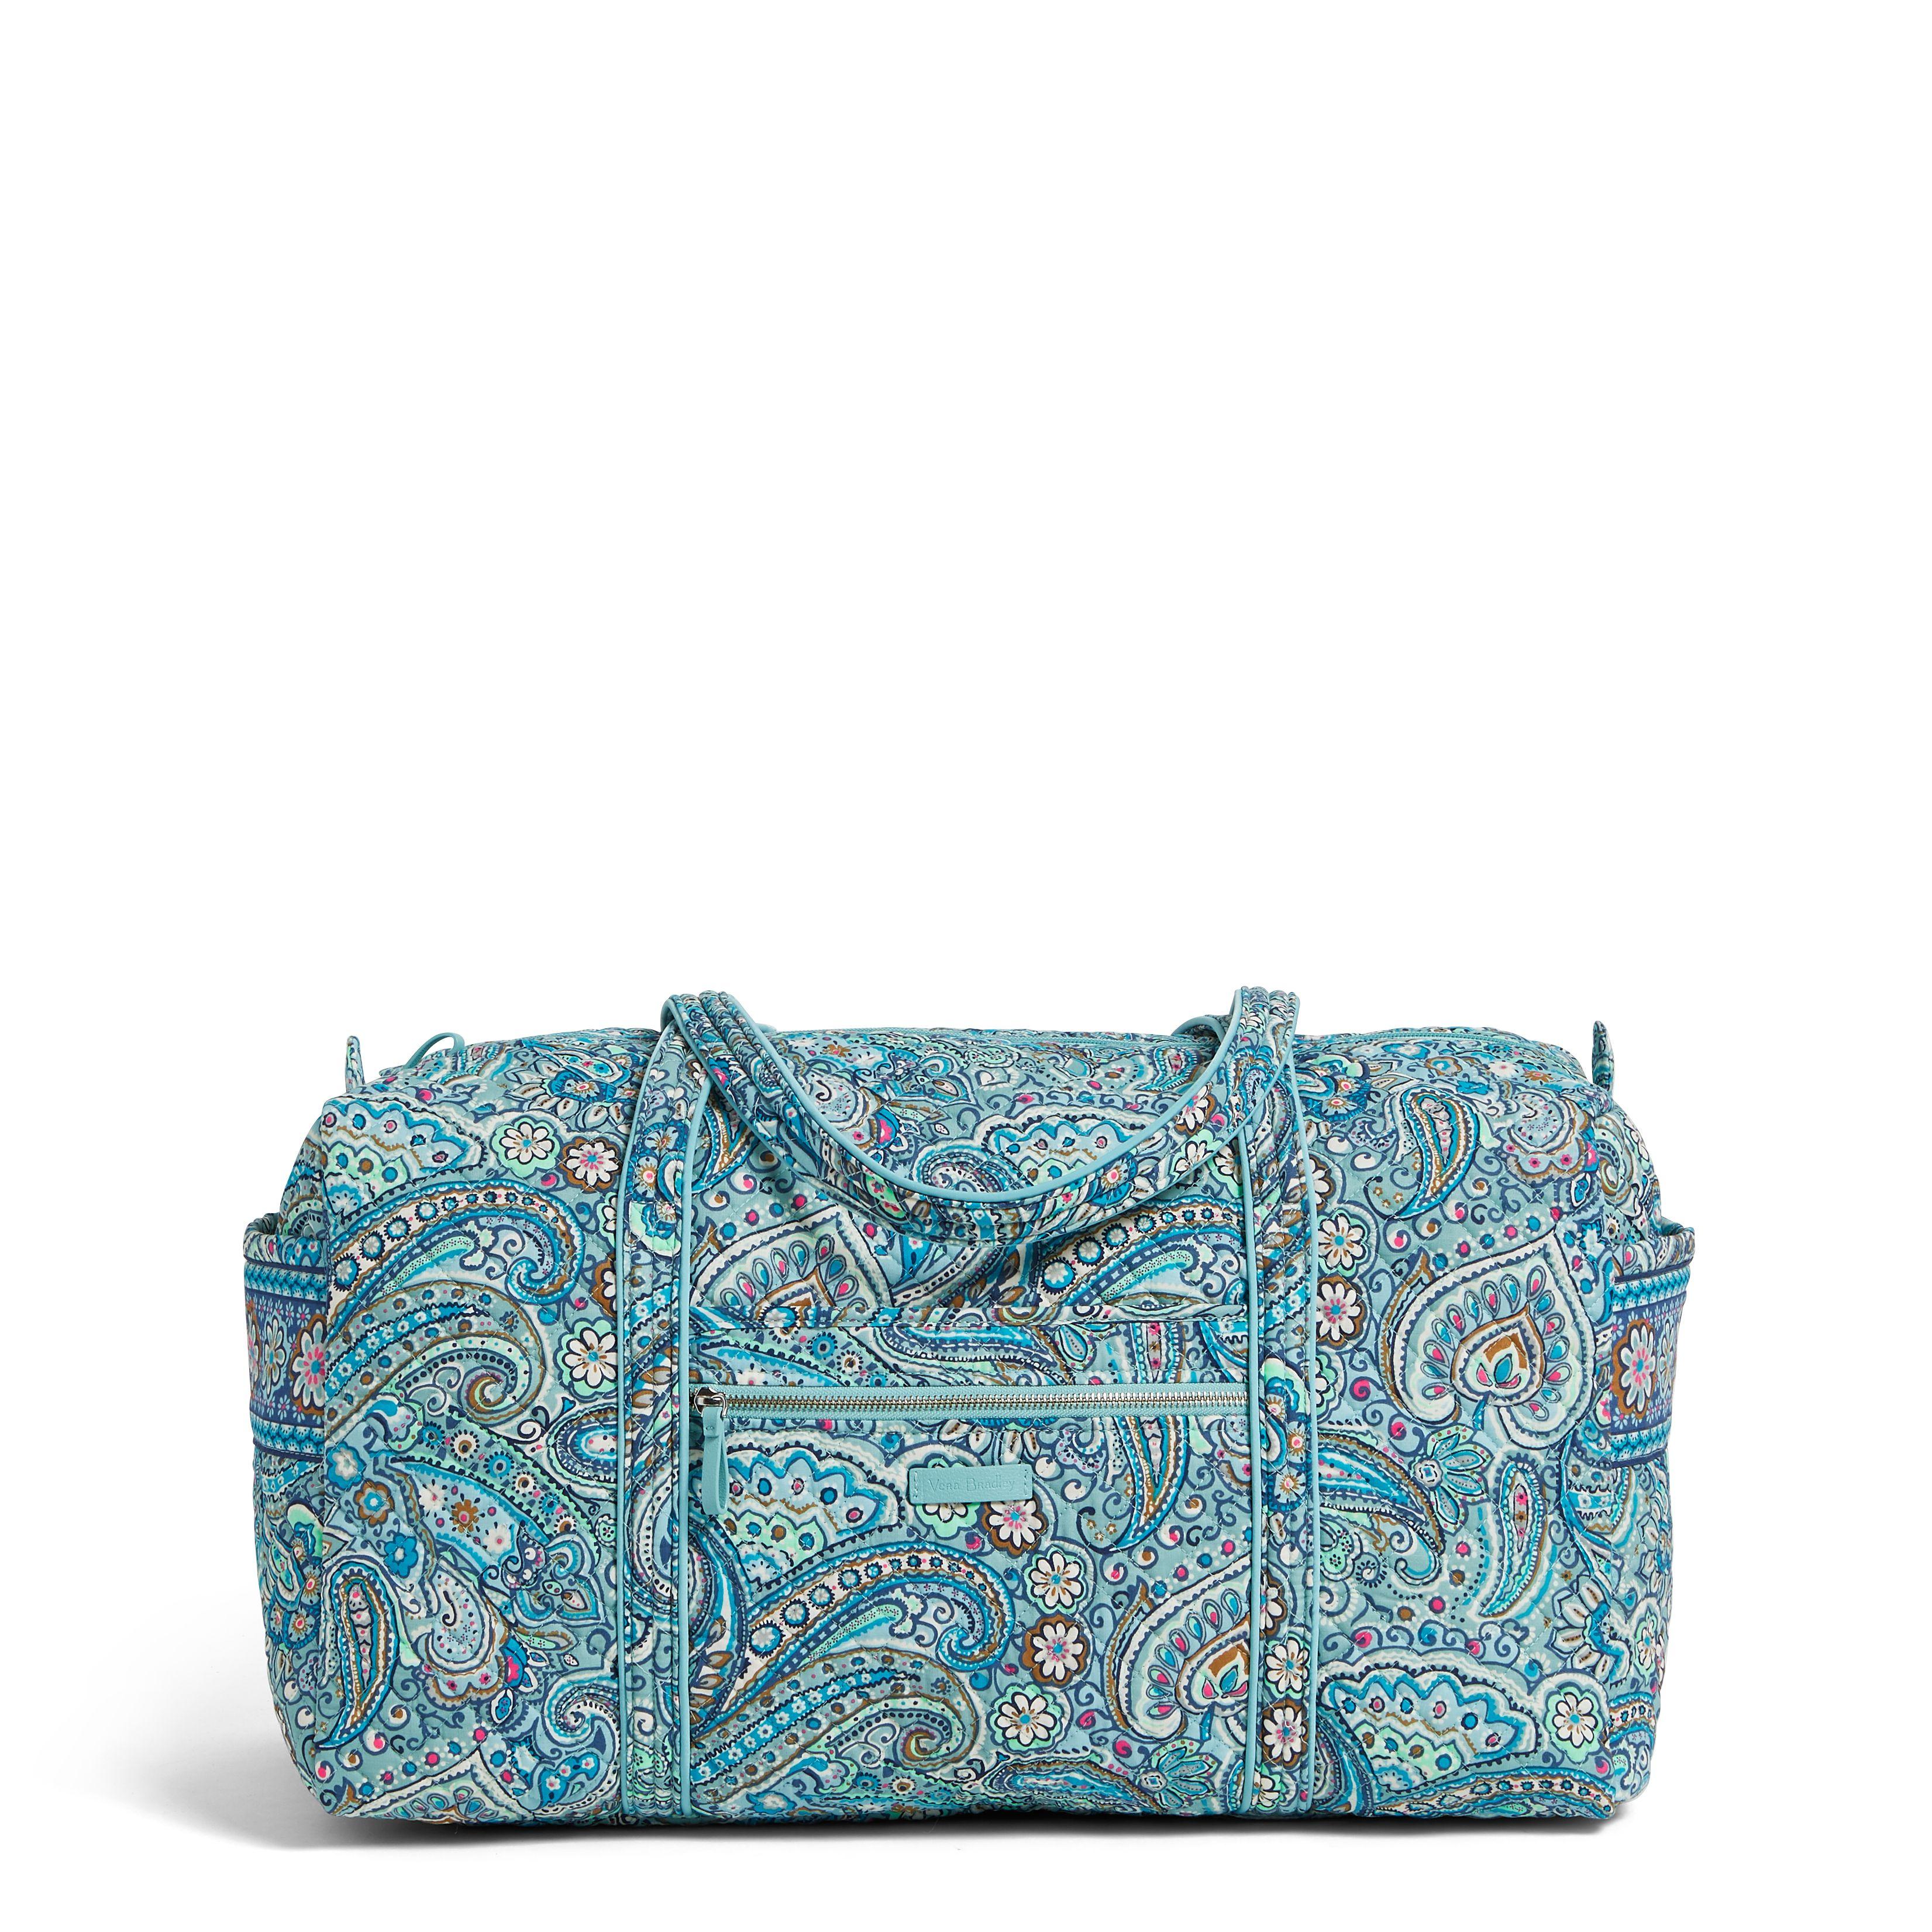 Travel Duffel Bags for Women - Travel | Vera